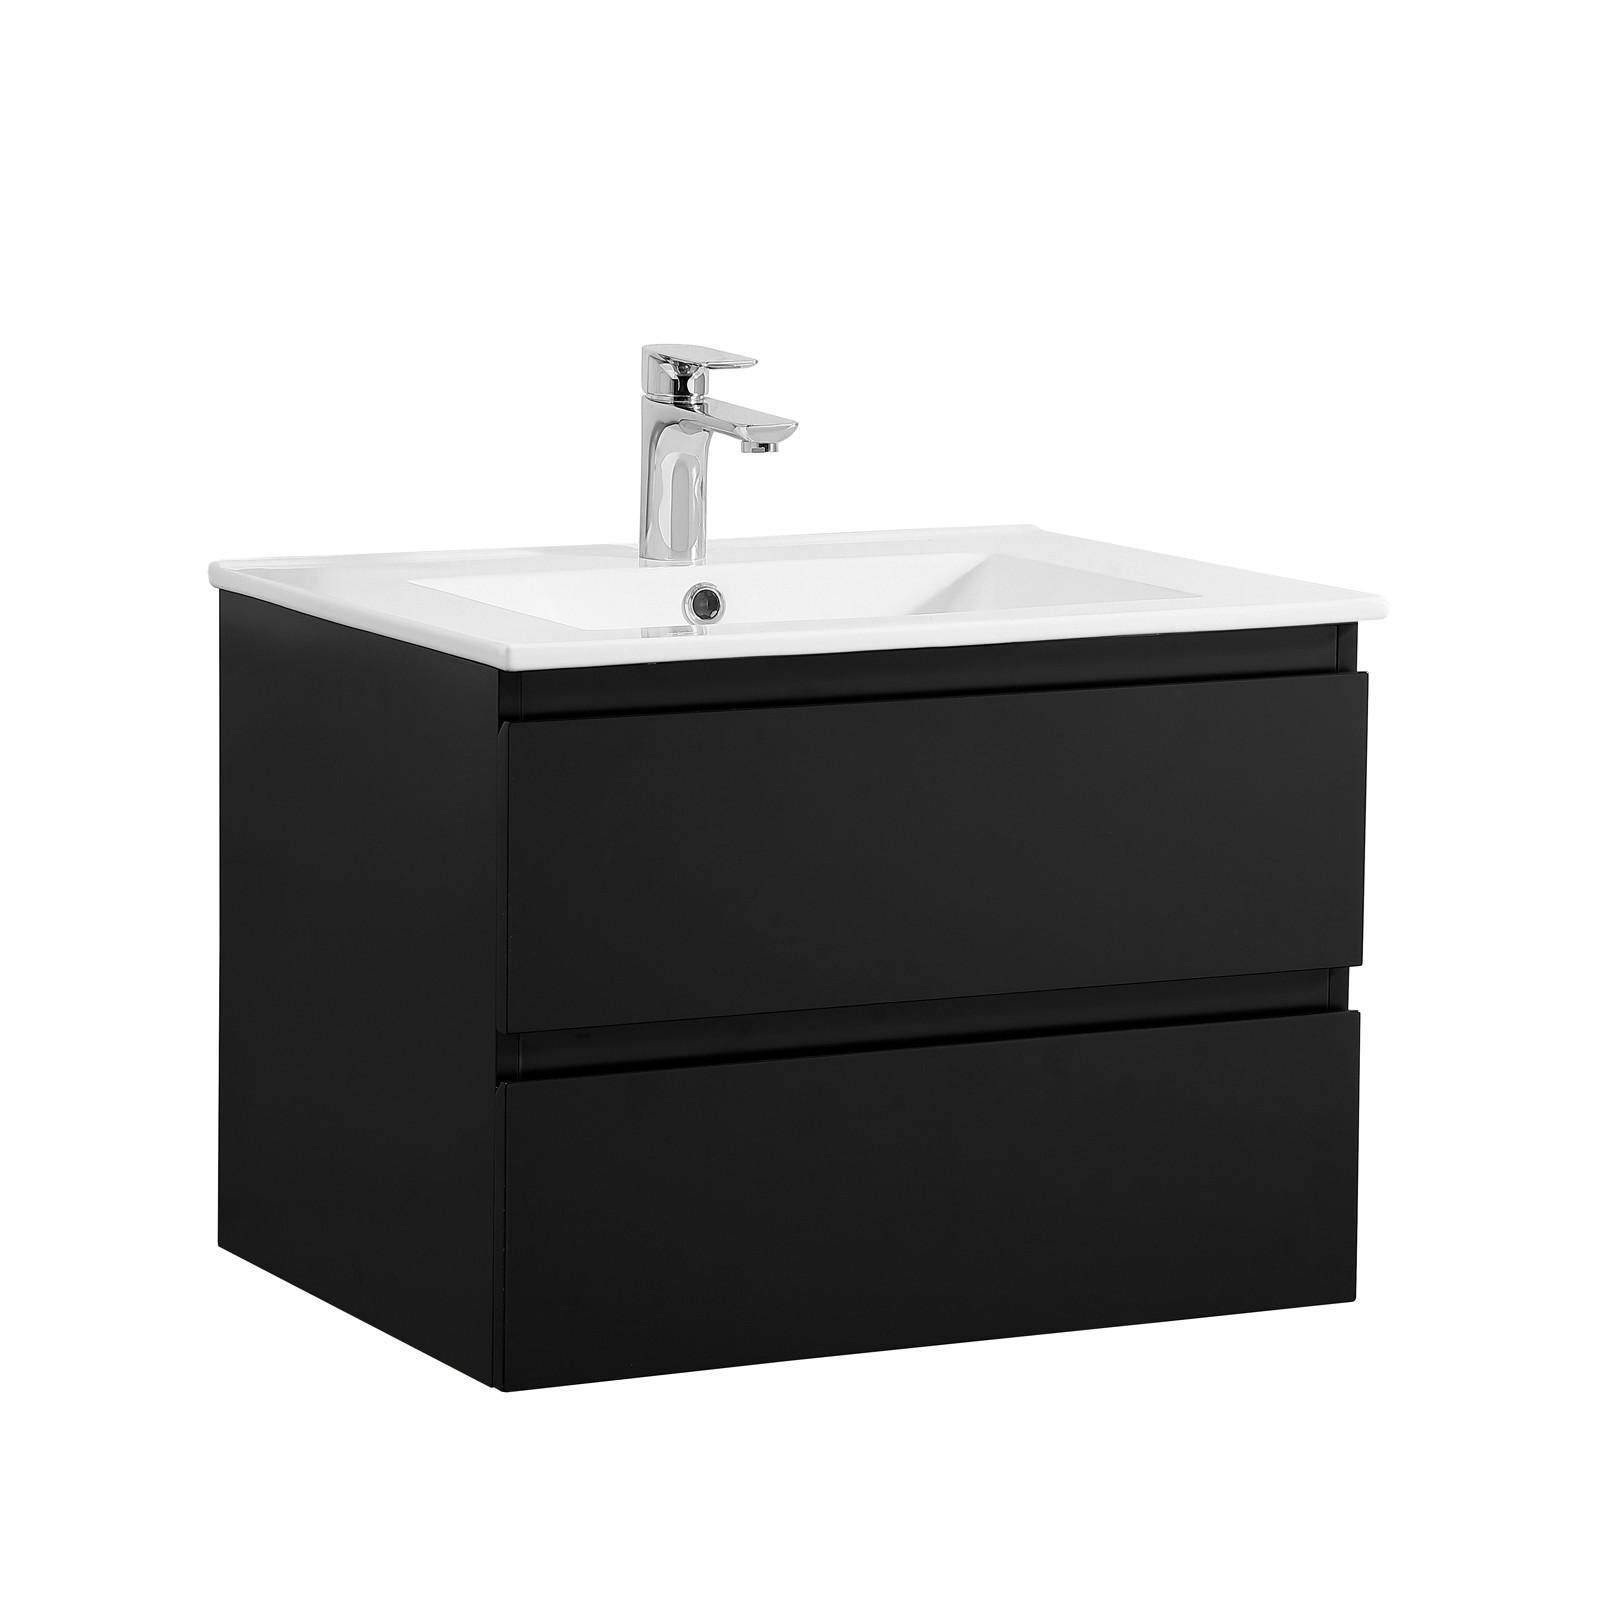 Meuble Salle de Bain 60 cm Suspendu Noir Carbone + Miroir SORRENTO